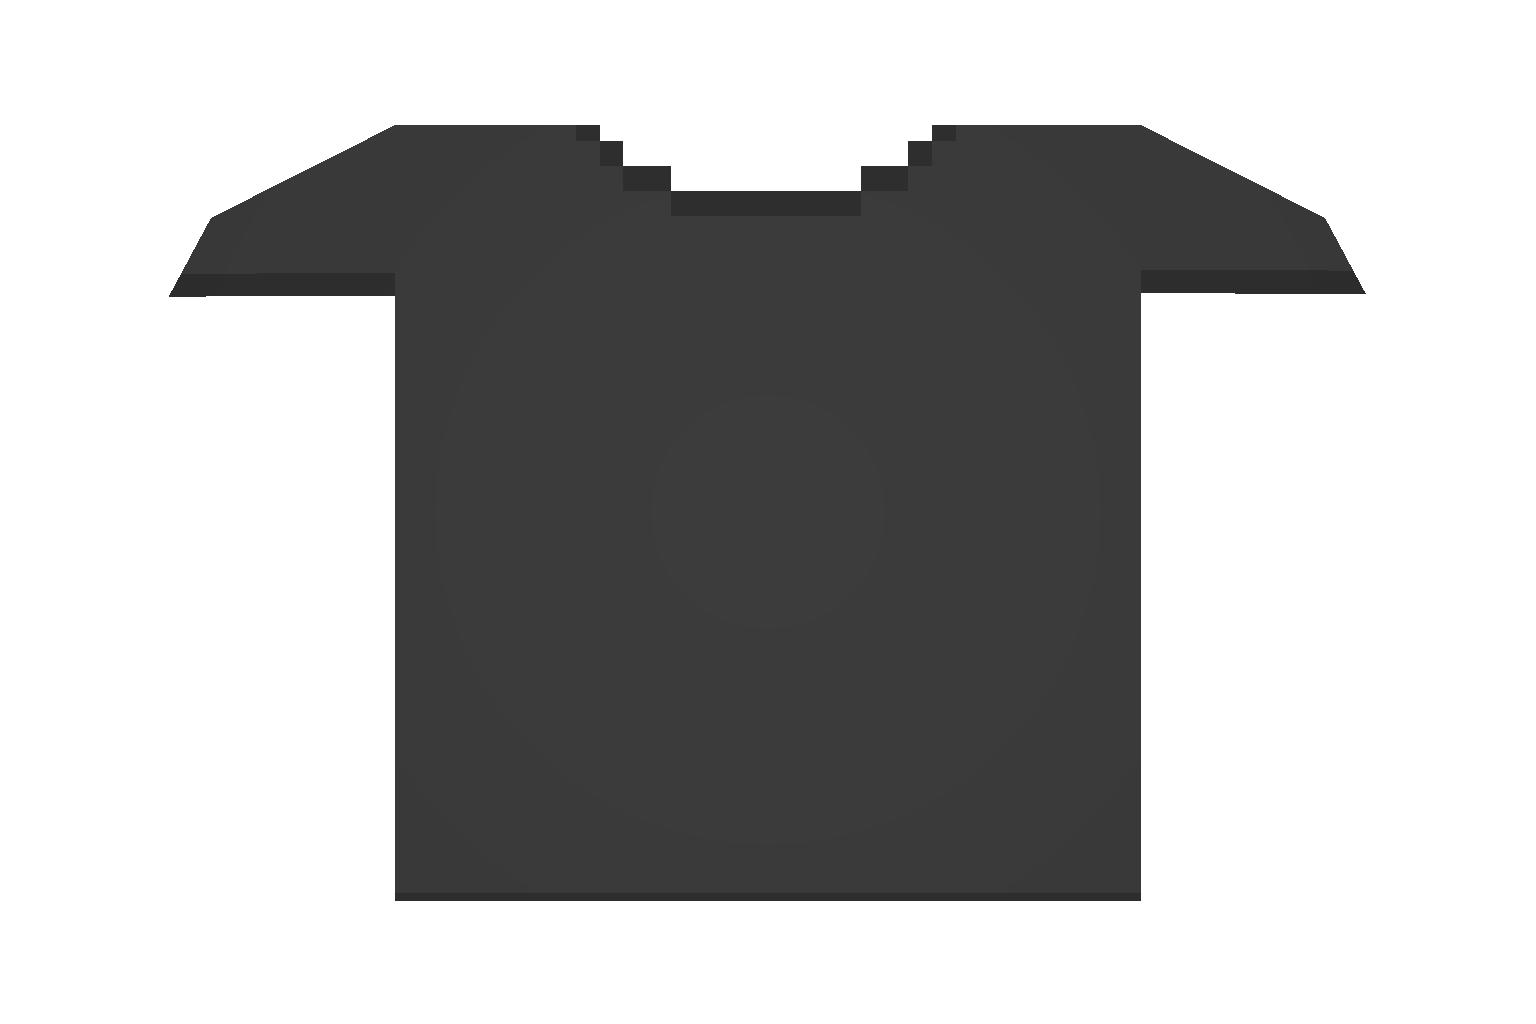 T Shirt Unturned Bunker Wiki